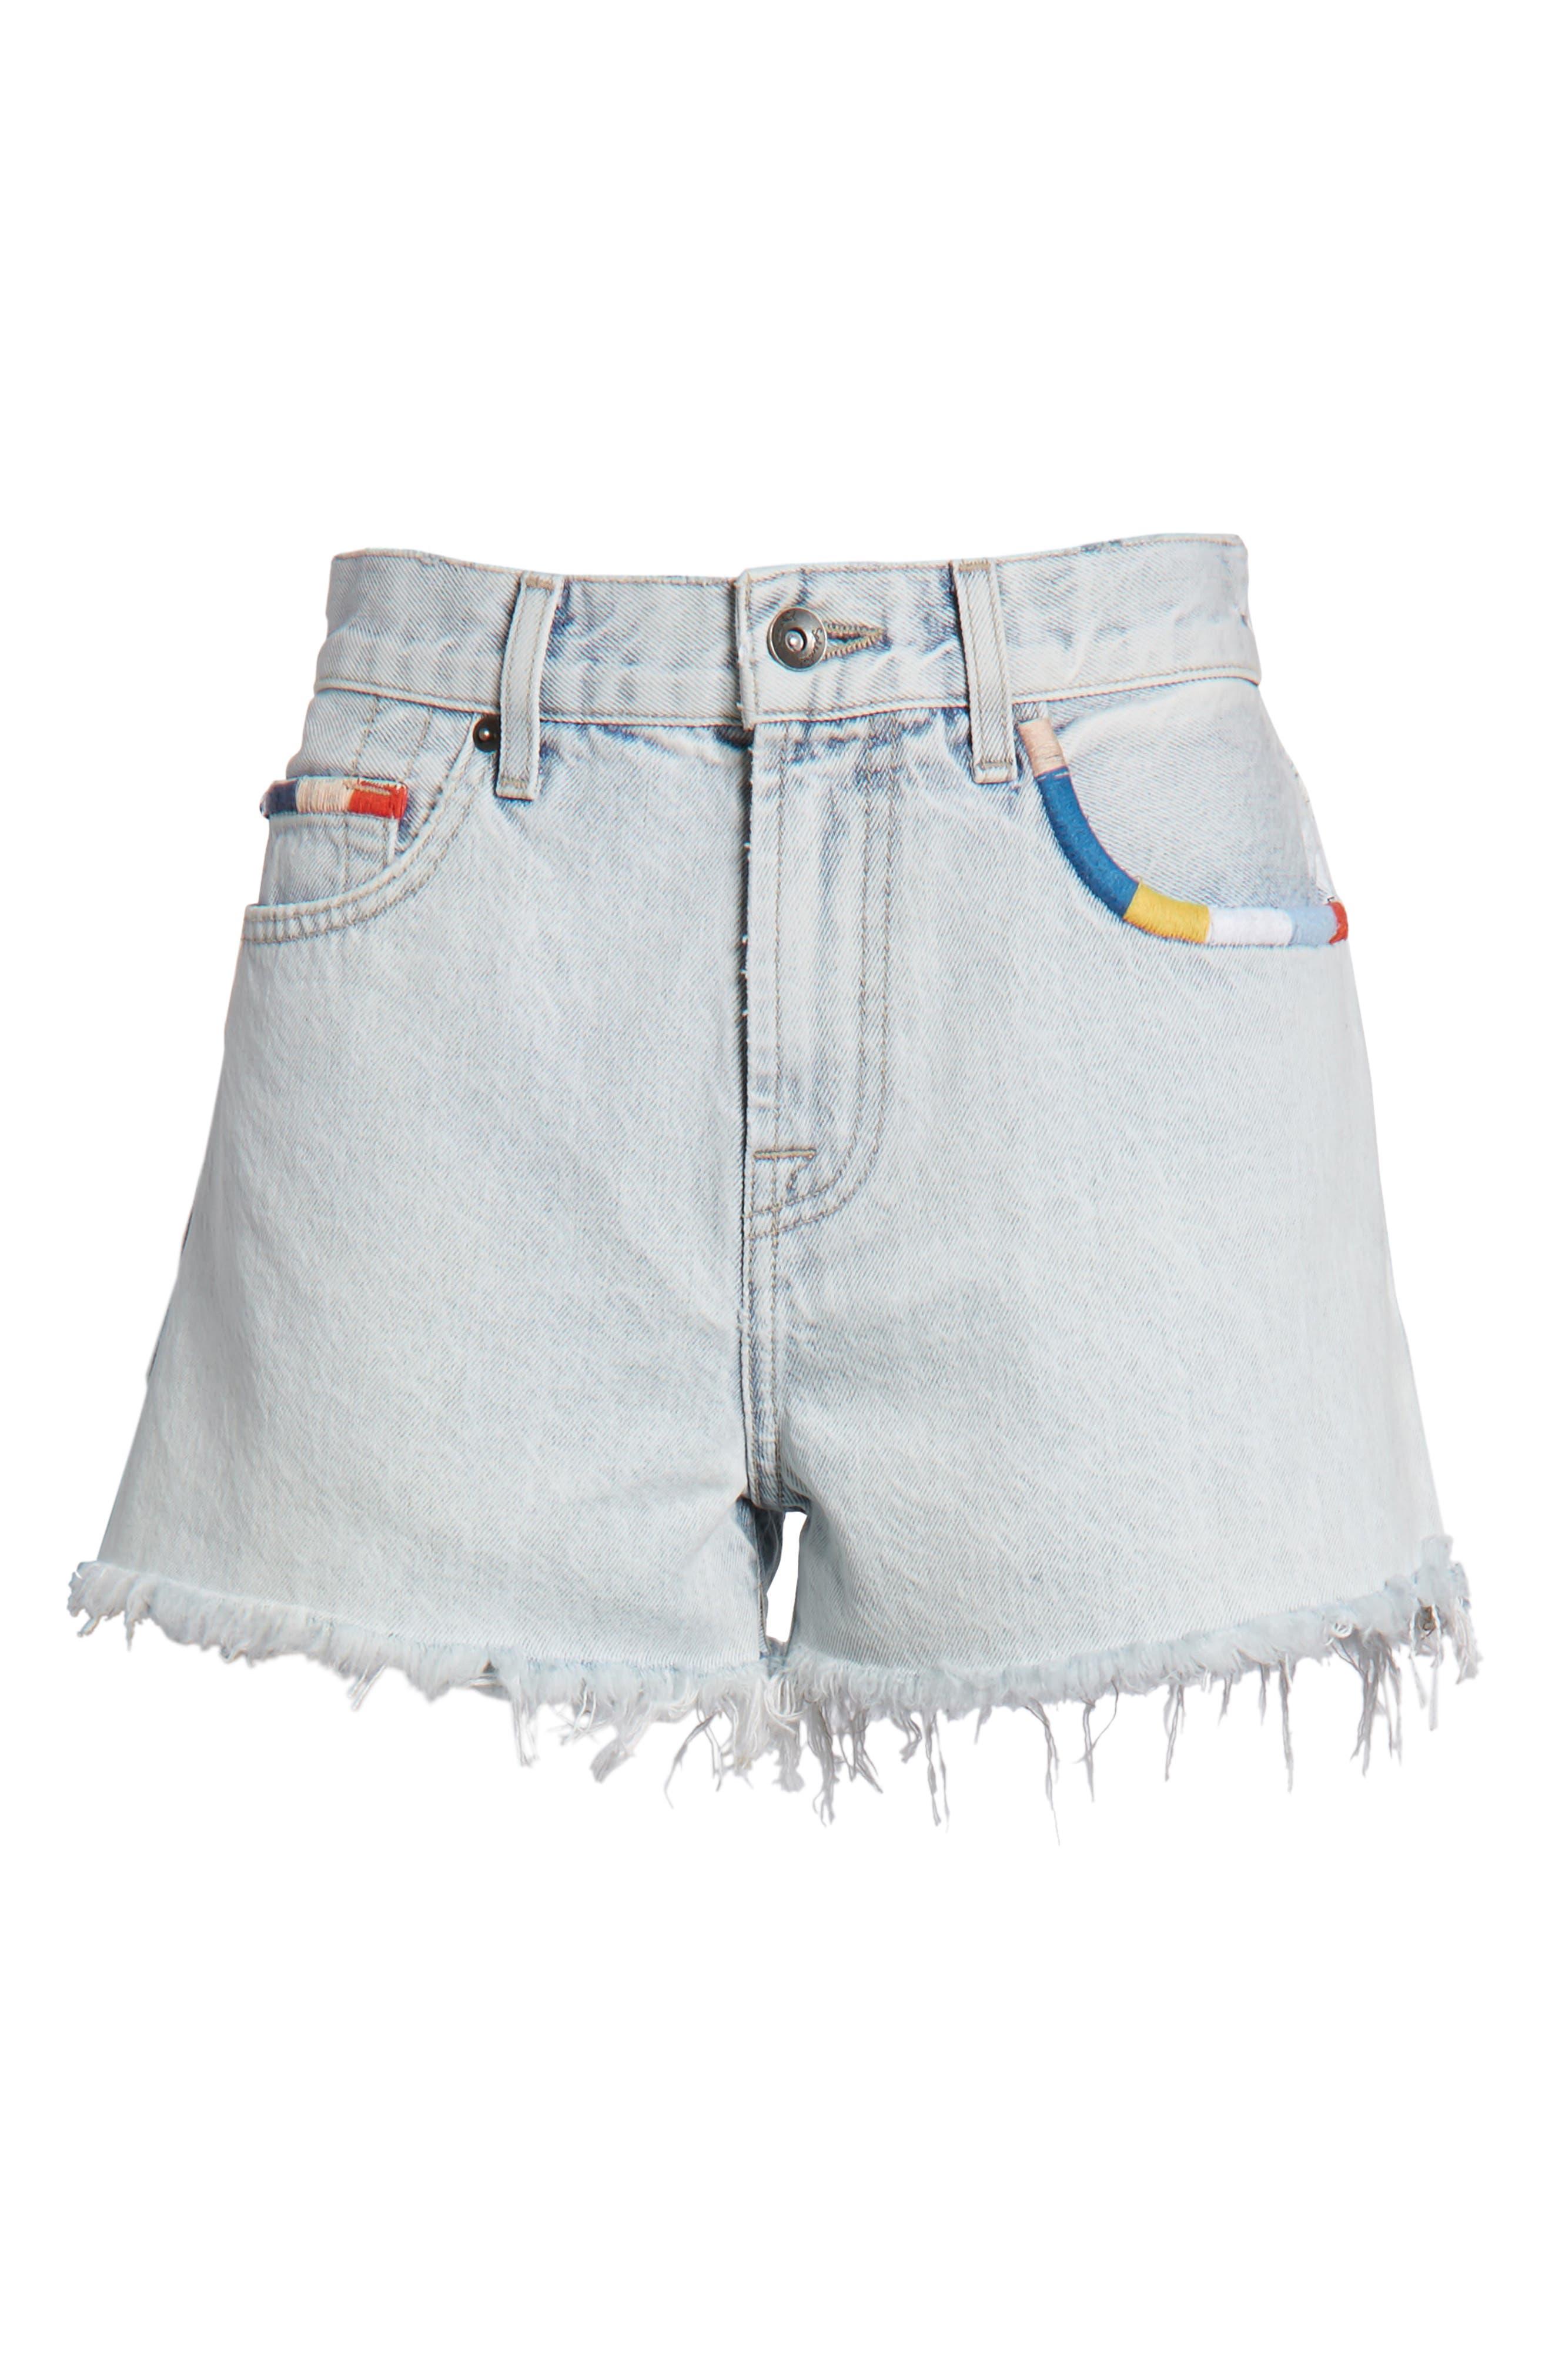 x Margherita Amore Denim Cutoff Shorts,                             Alternate thumbnail 6, color,                             Capriember